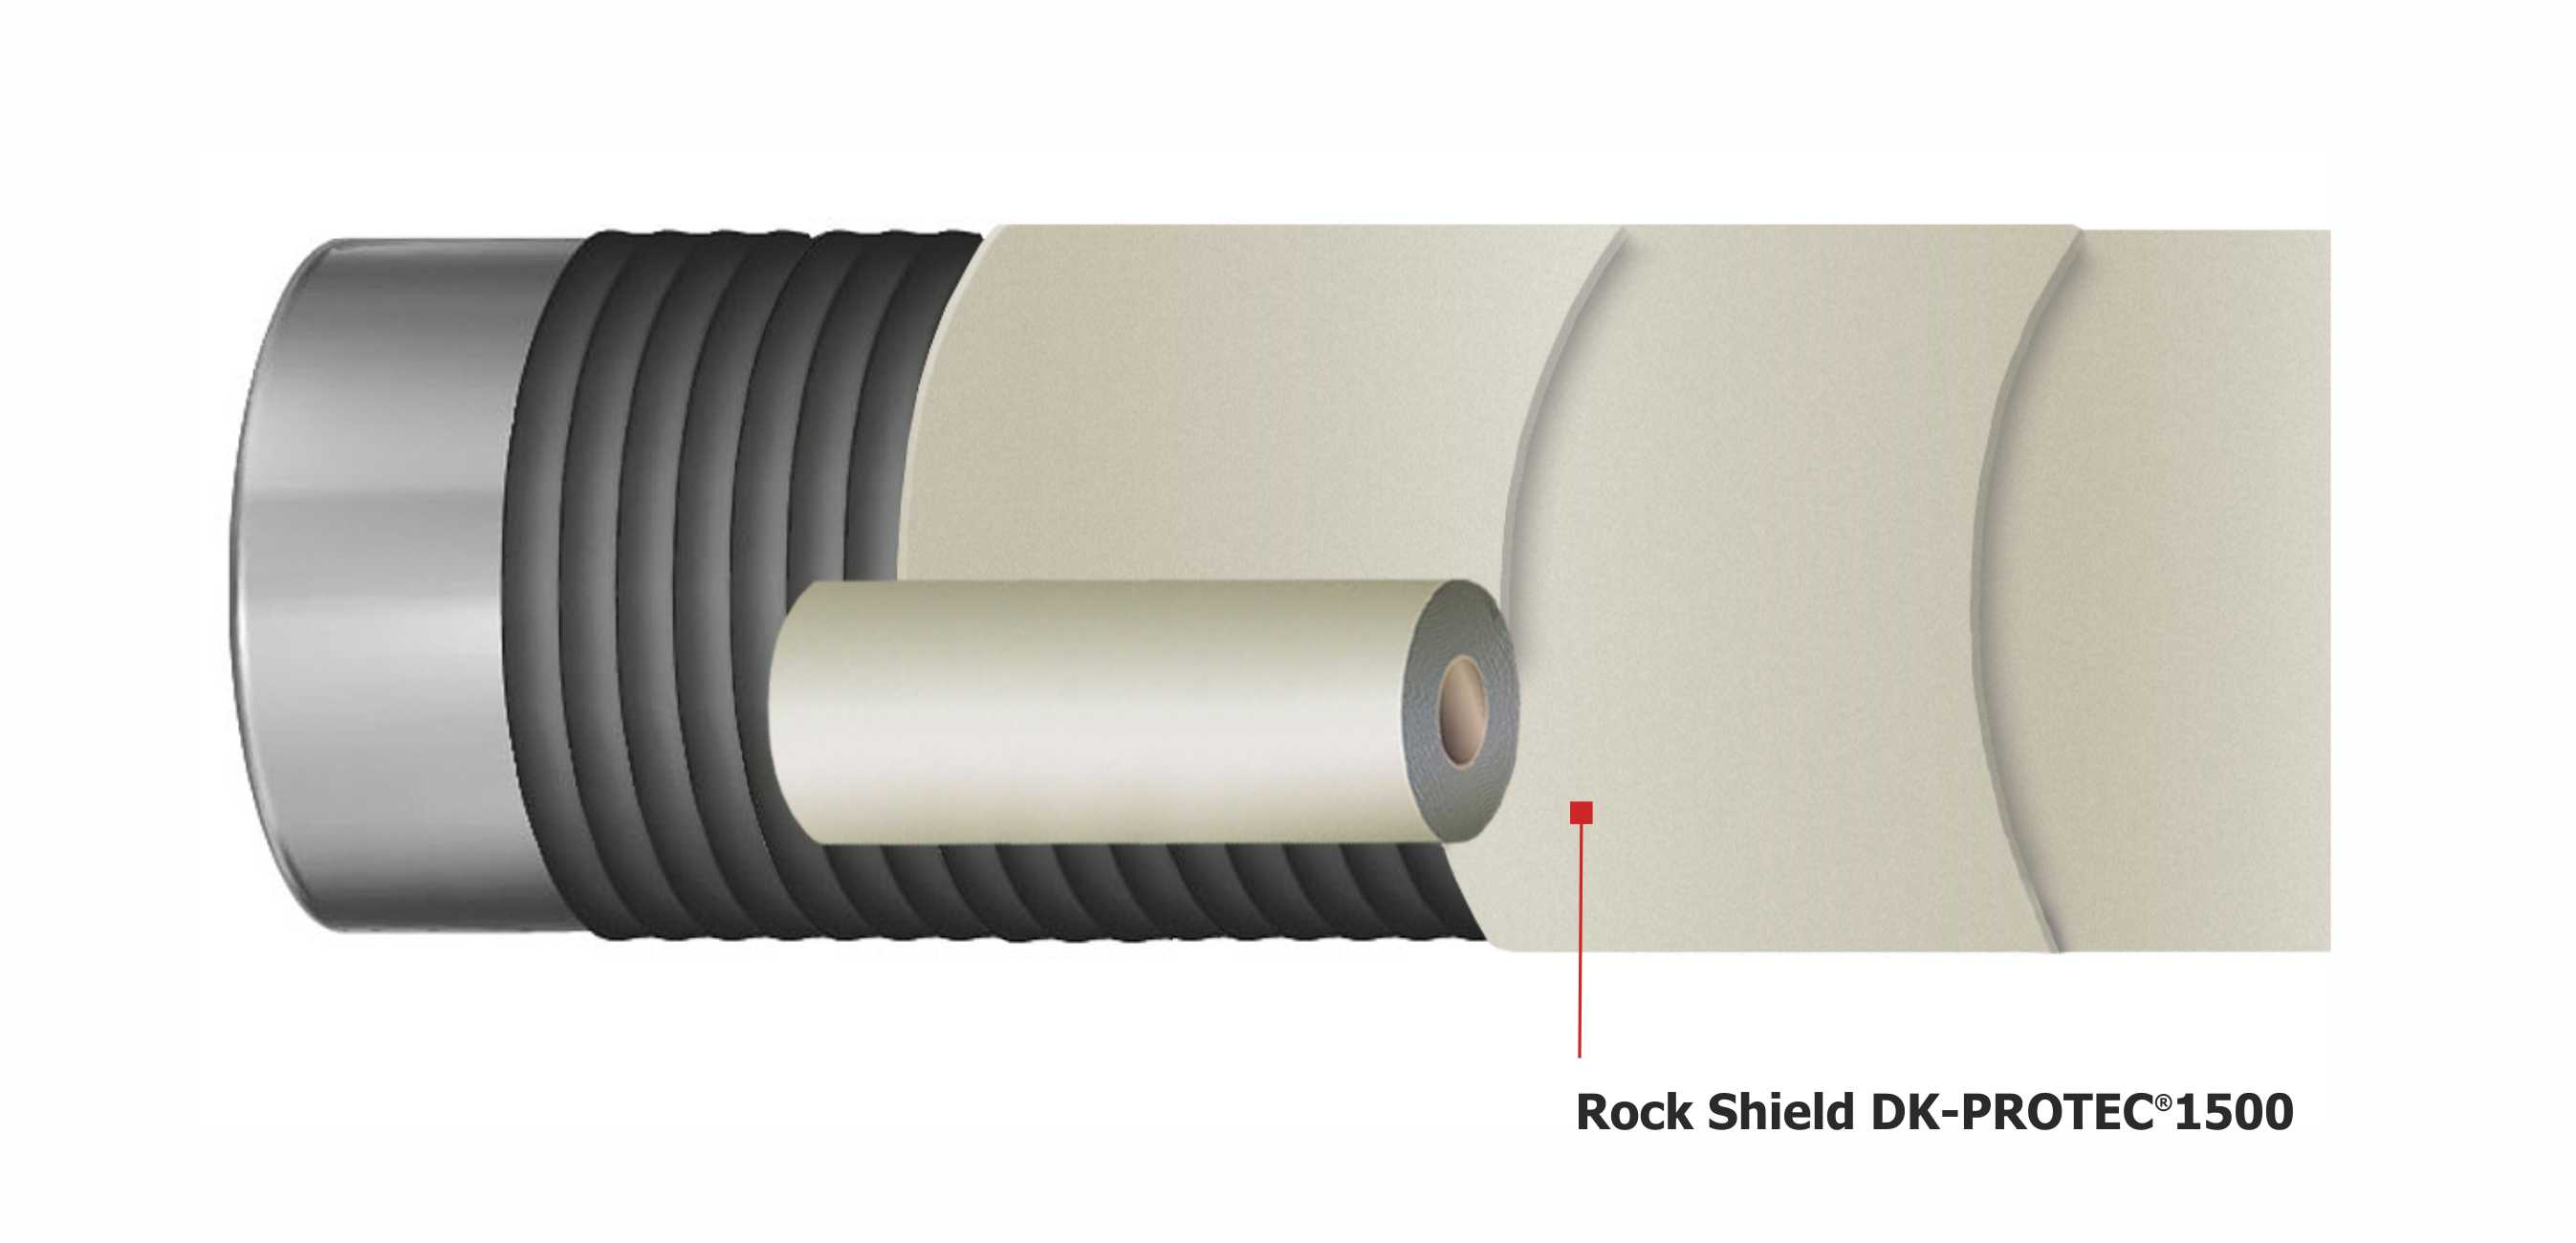 Illustration ROCK SHIELD DK-PROTEC®1500